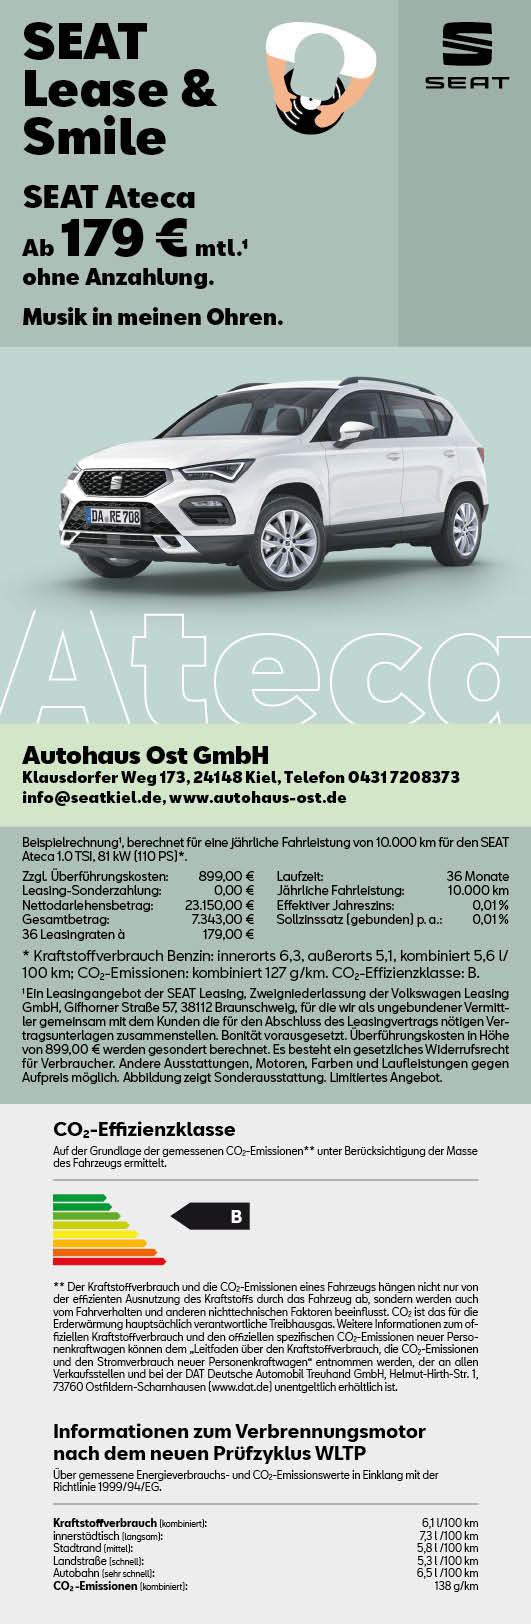 Anzeige SEAT Ateca